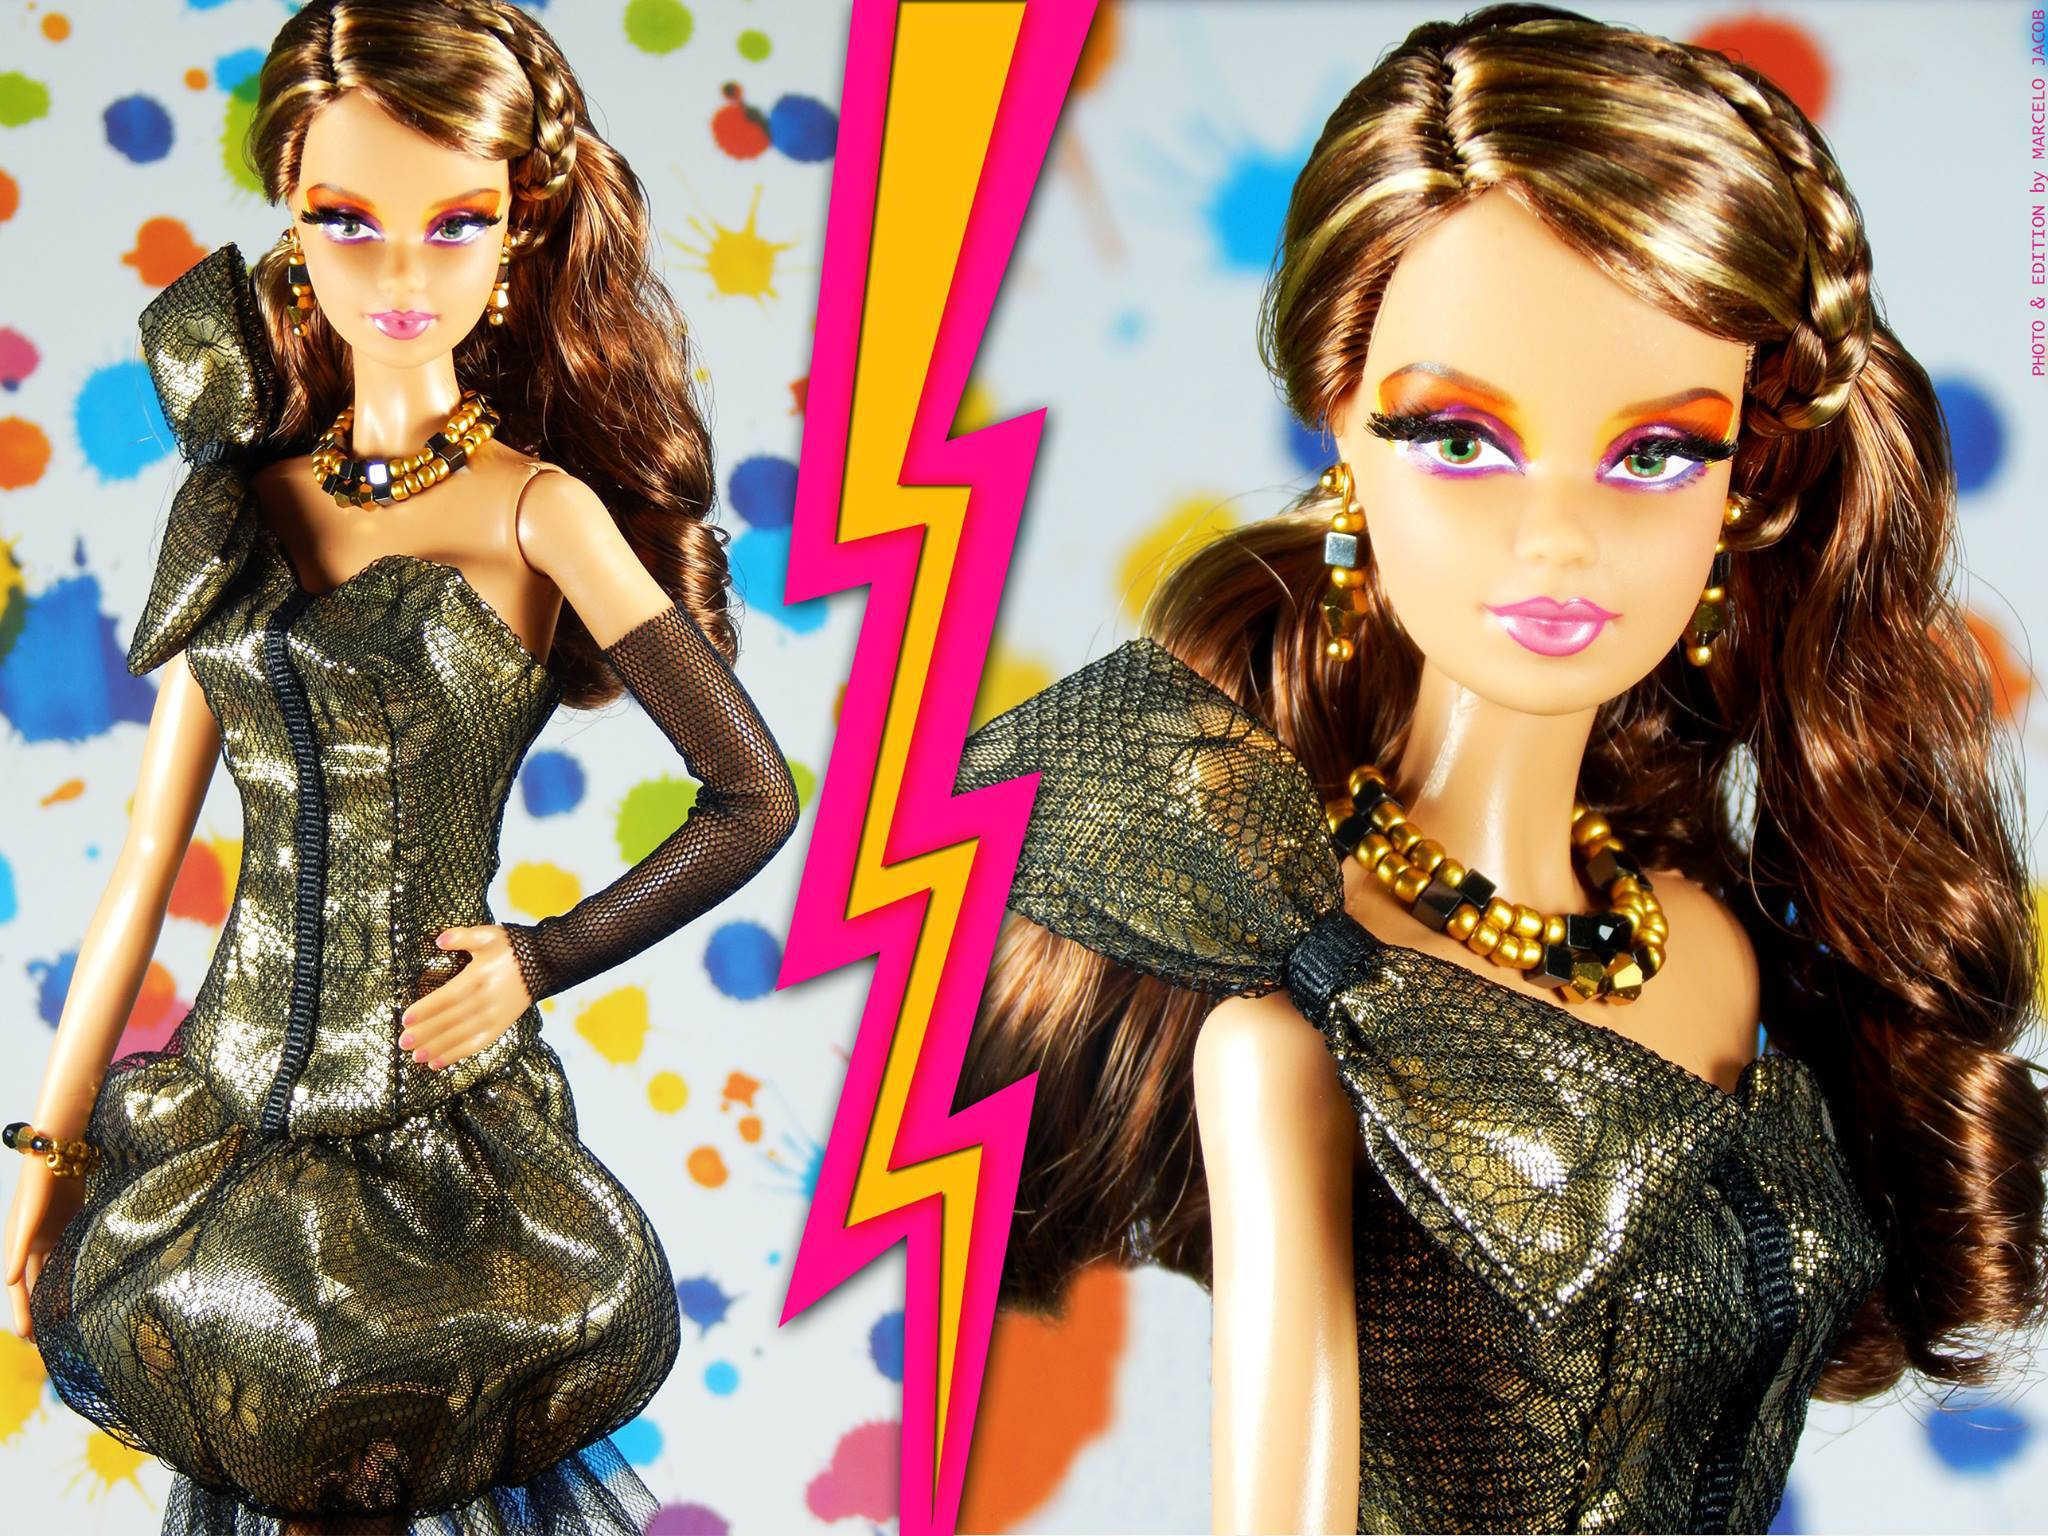 Target Barbie Fashionistas Dolls 2015 Golden Eternity Barbie